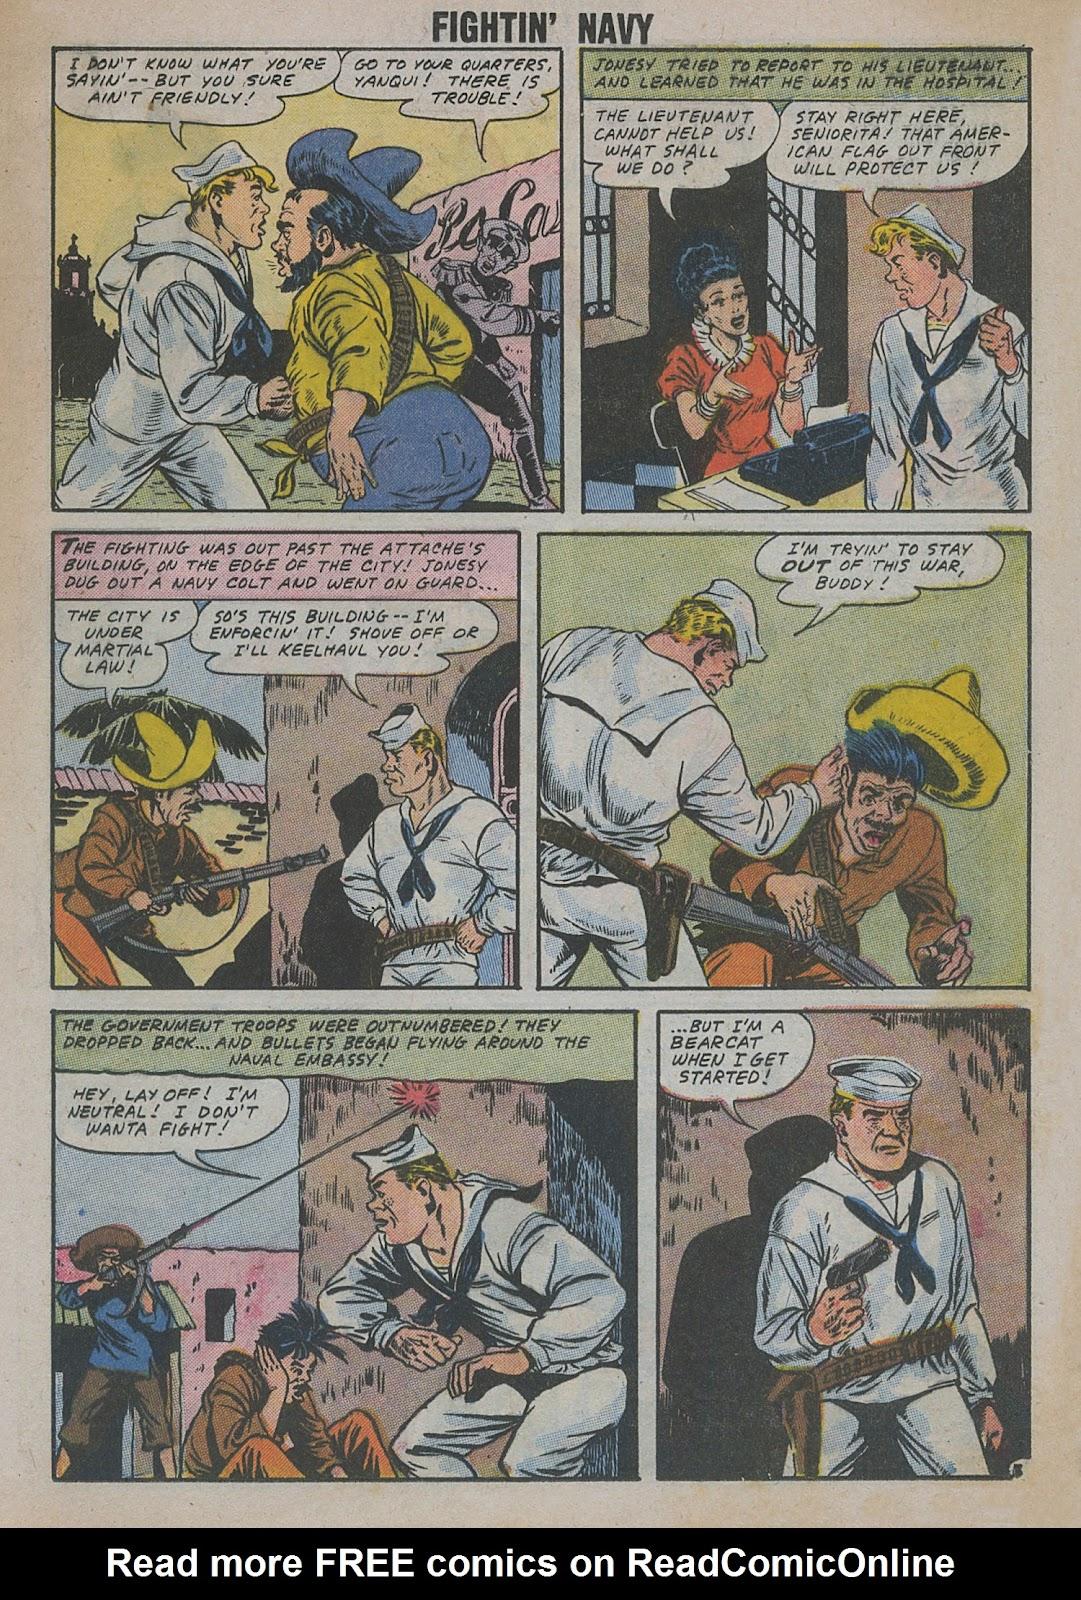 Read online Fightin' Navy comic -  Issue #82 - 31